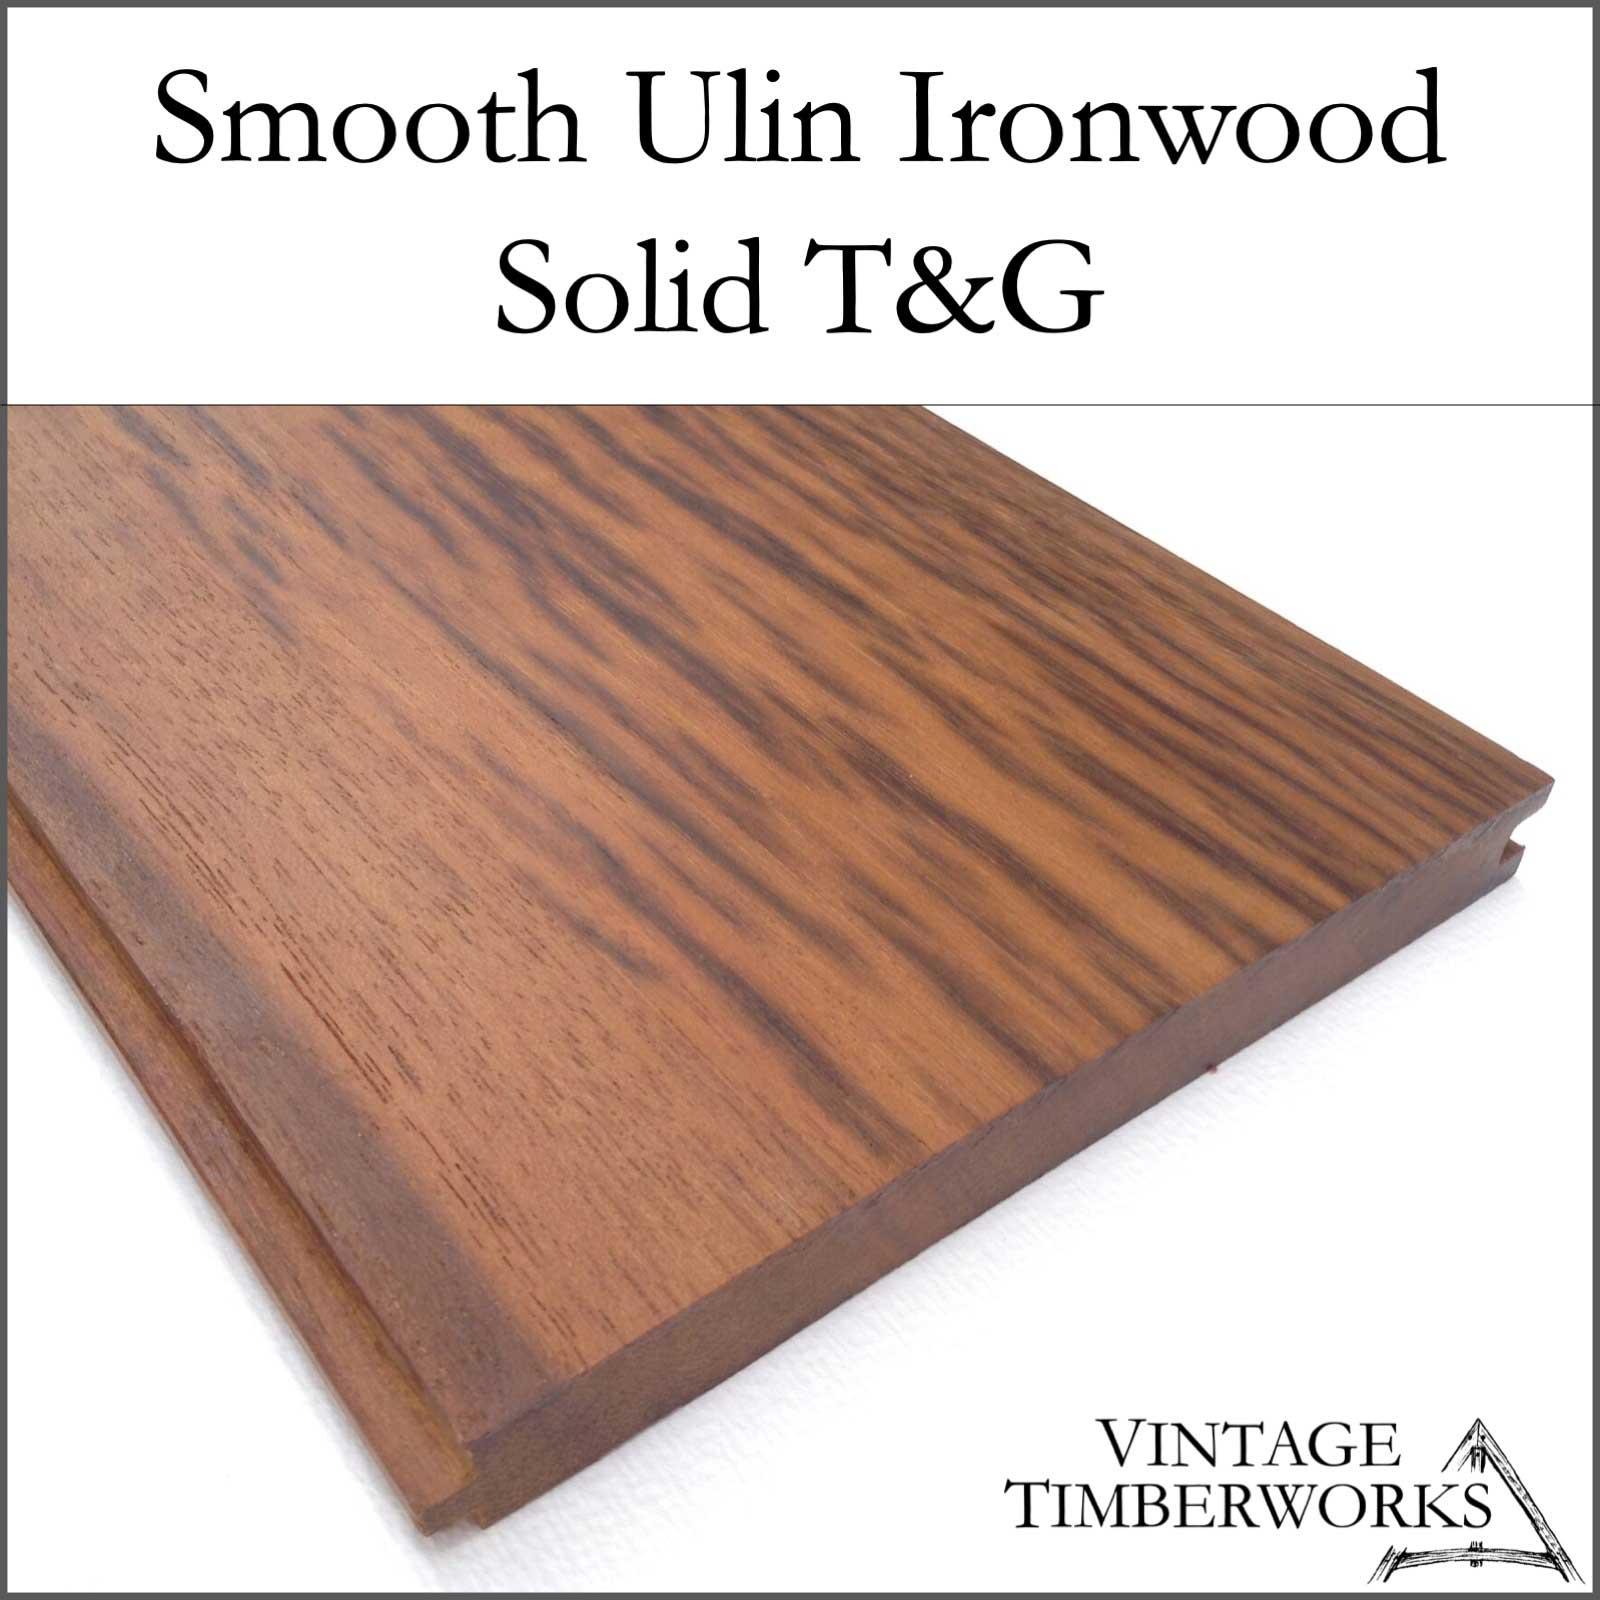 Smooth Ulin Ironwood Solid TG - Ulin Ironwood